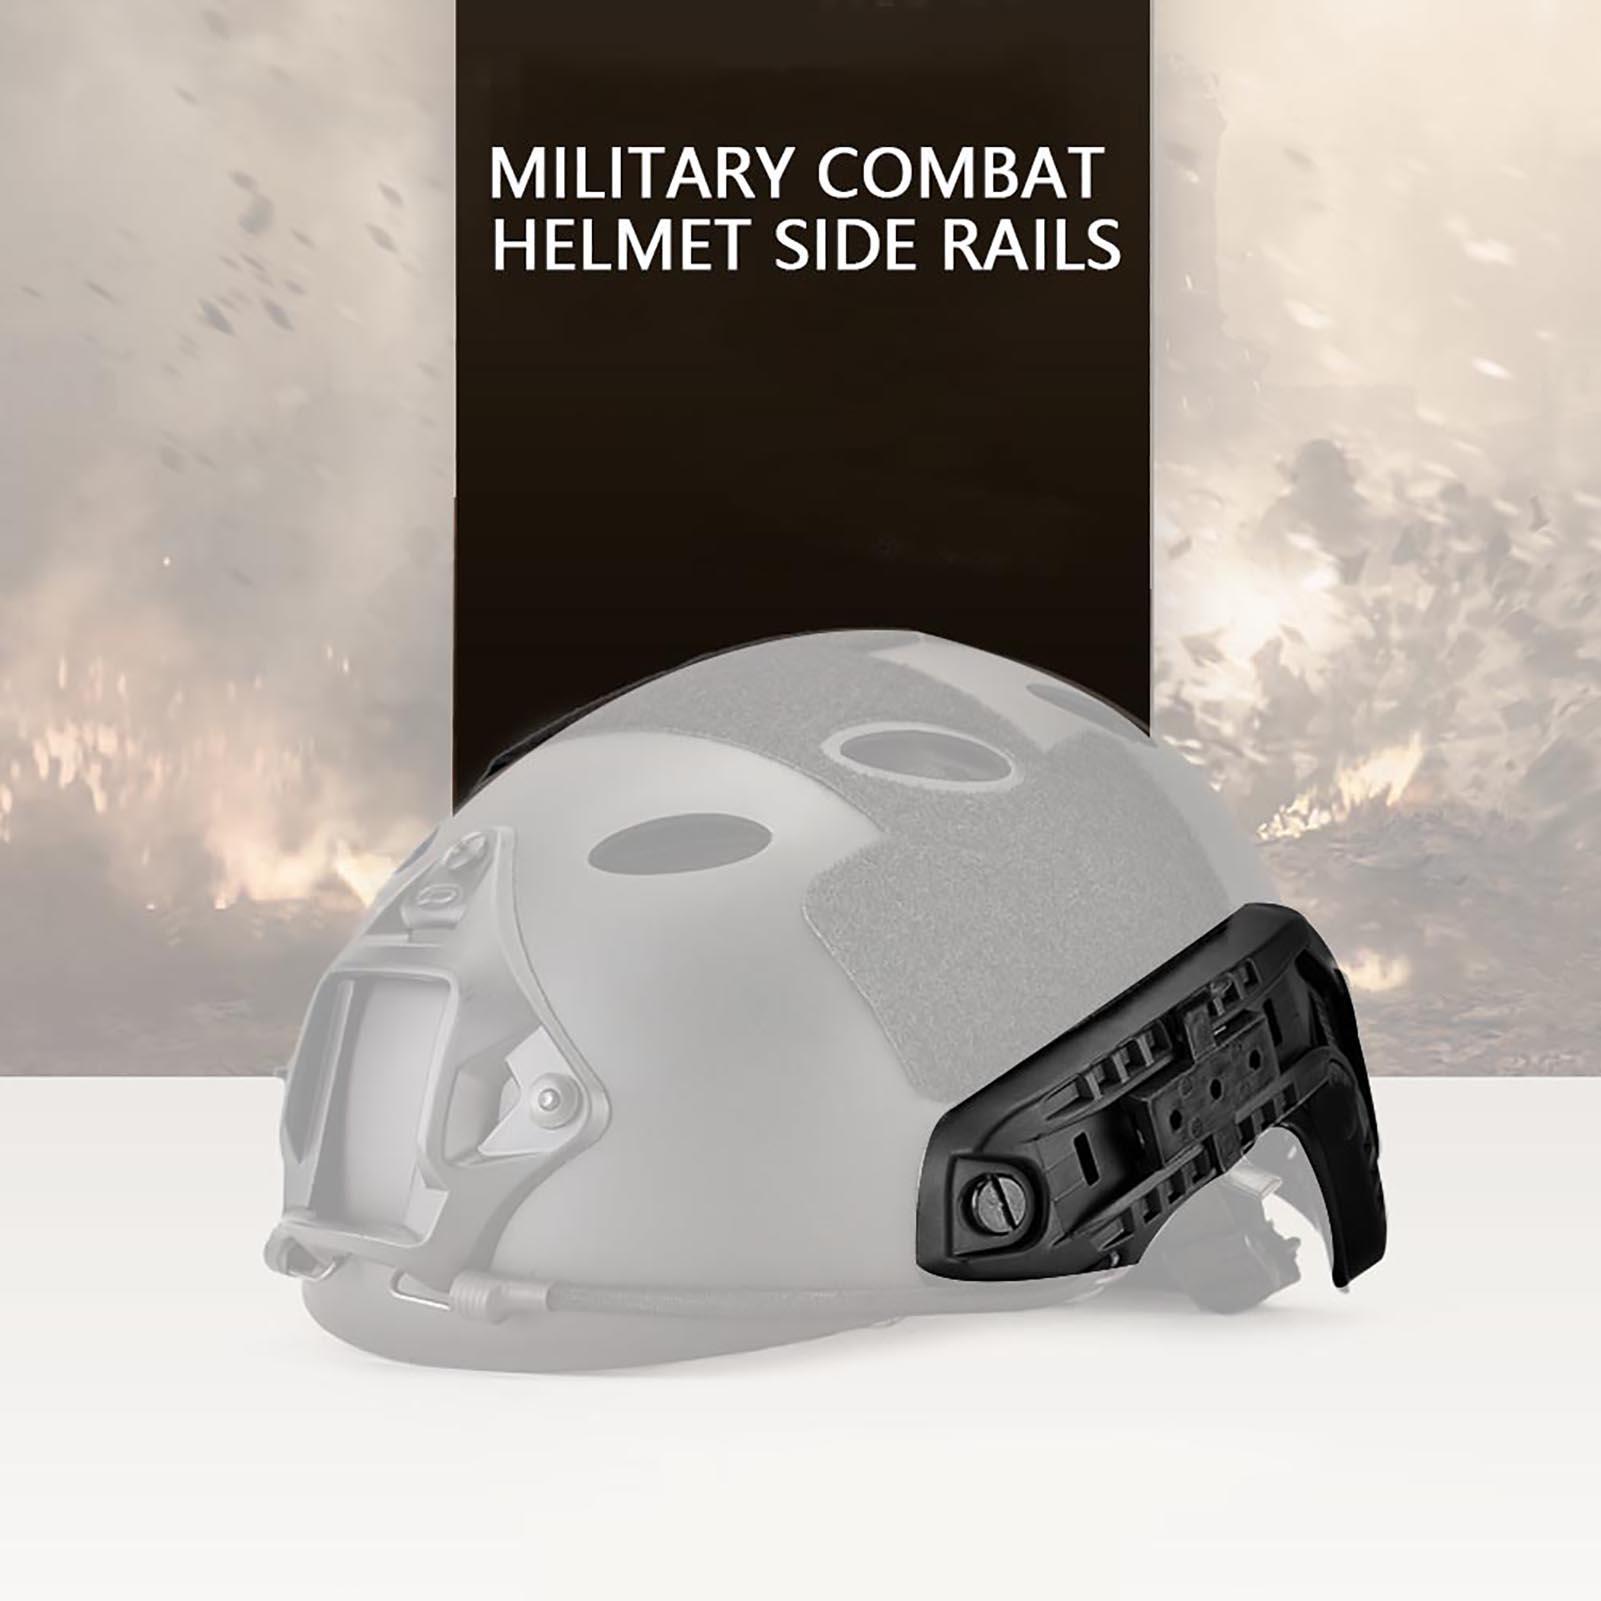 1Pair-Helmet-Side-Rails-for-Flashlight-Camera-Attachments-W-Mounting-Screws-Kit thumbnail 14